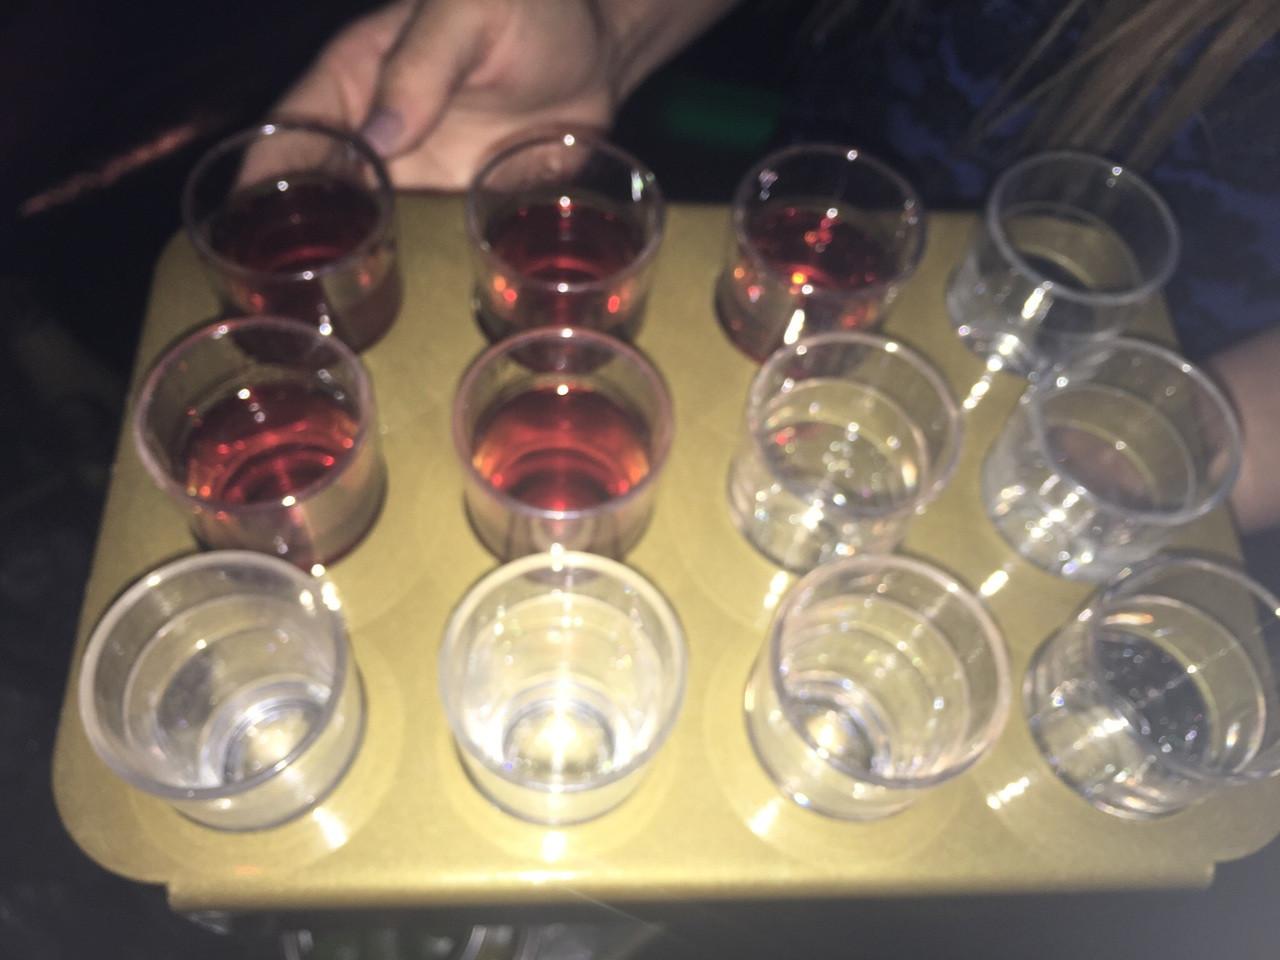 dozen, Top view, Shot Tray, Shot, cup, carrier, holder, Shot,Shot shot shot